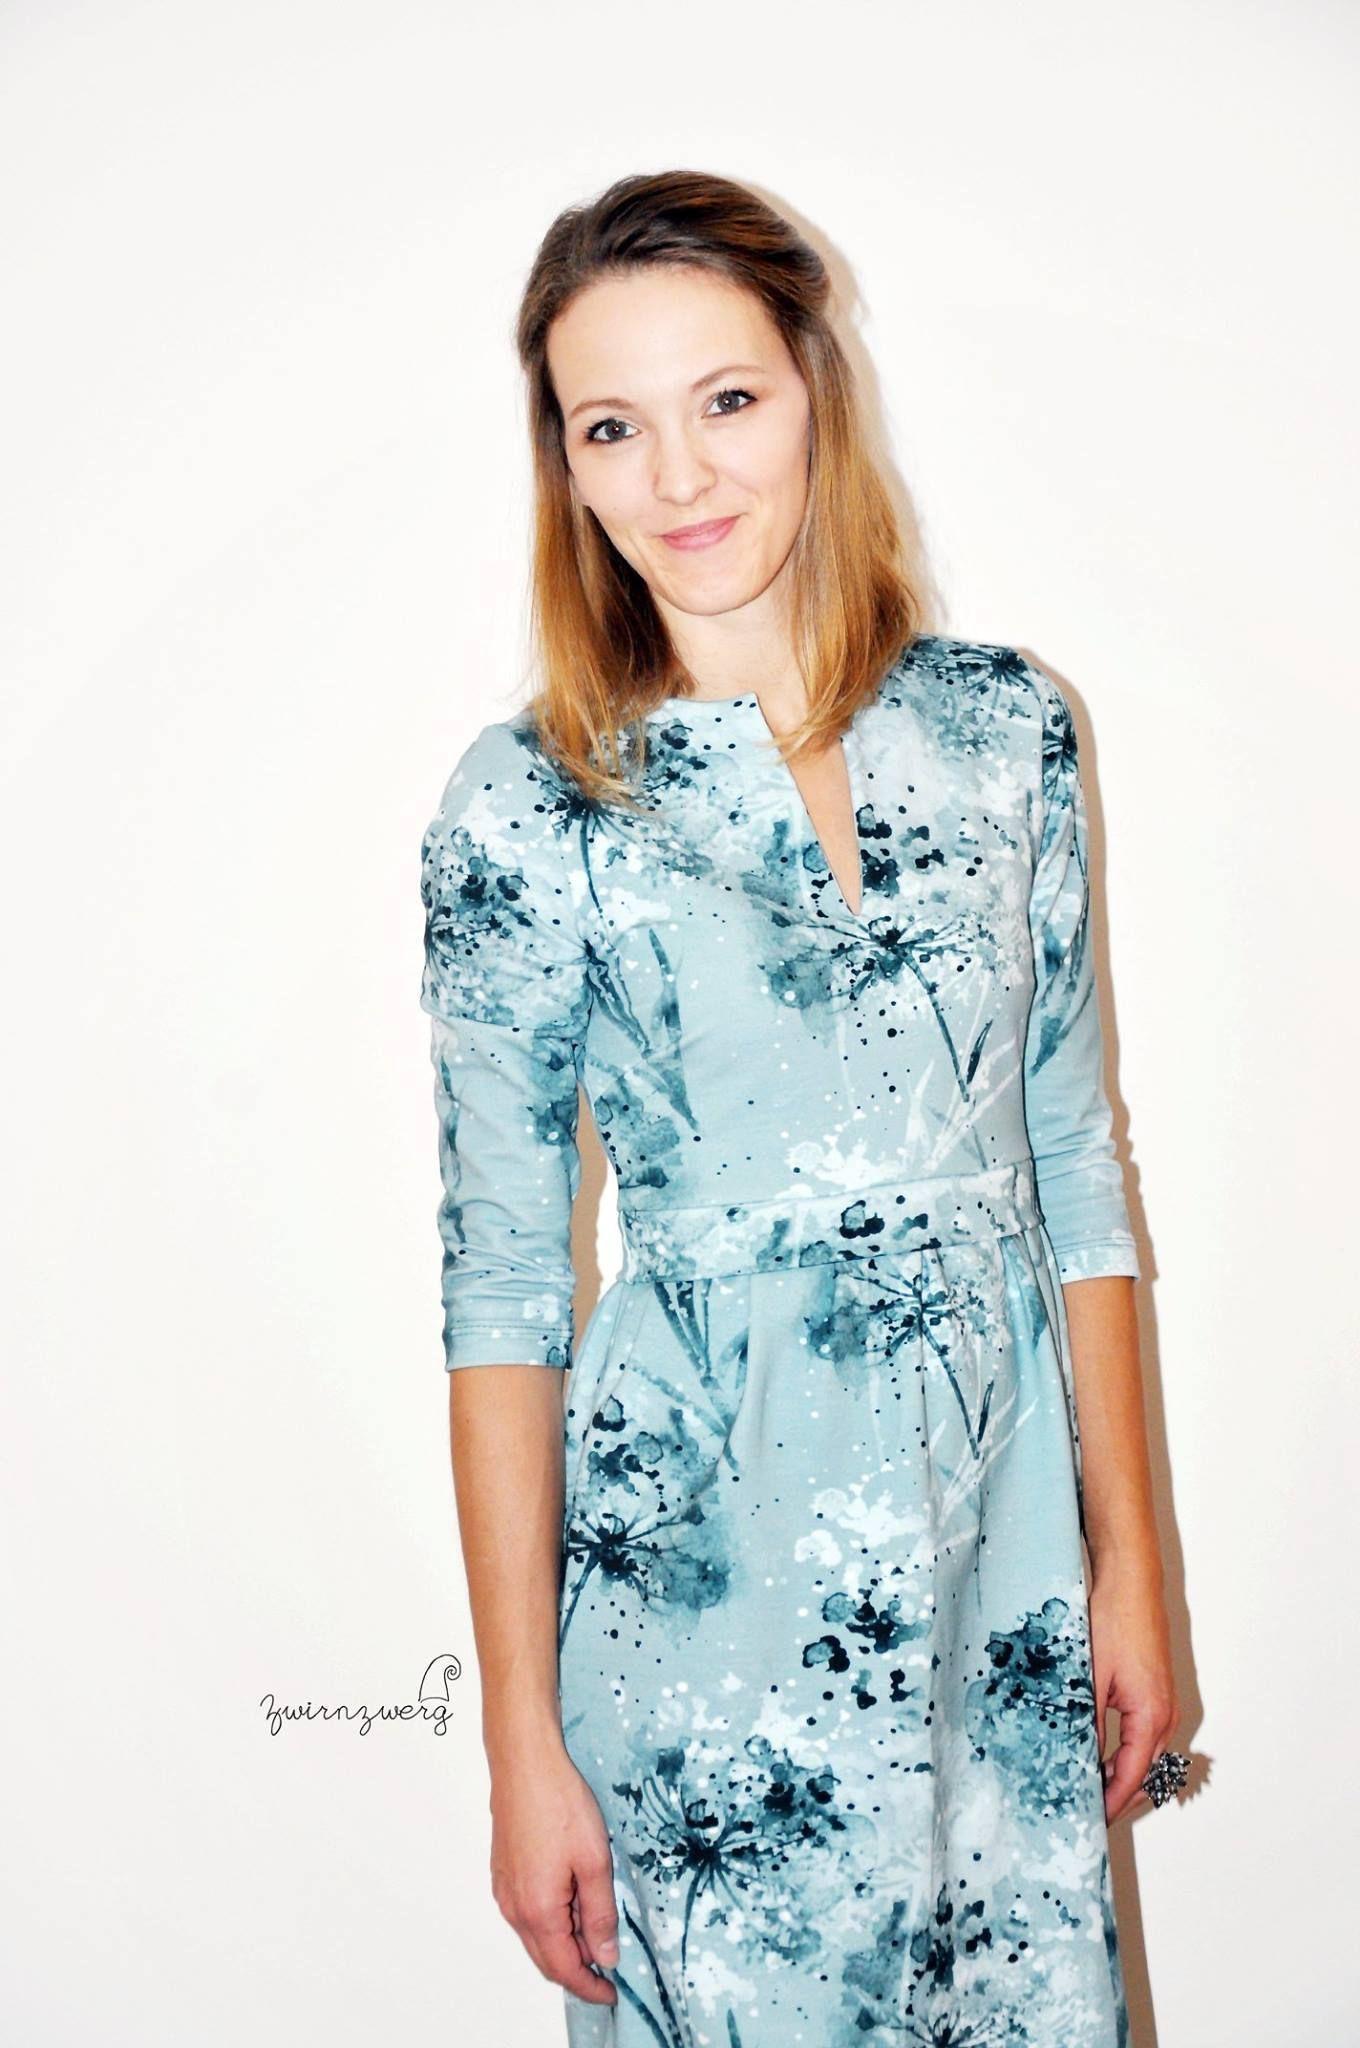 8 Genial Edle Damen Kleider Stylish - Abendkleid